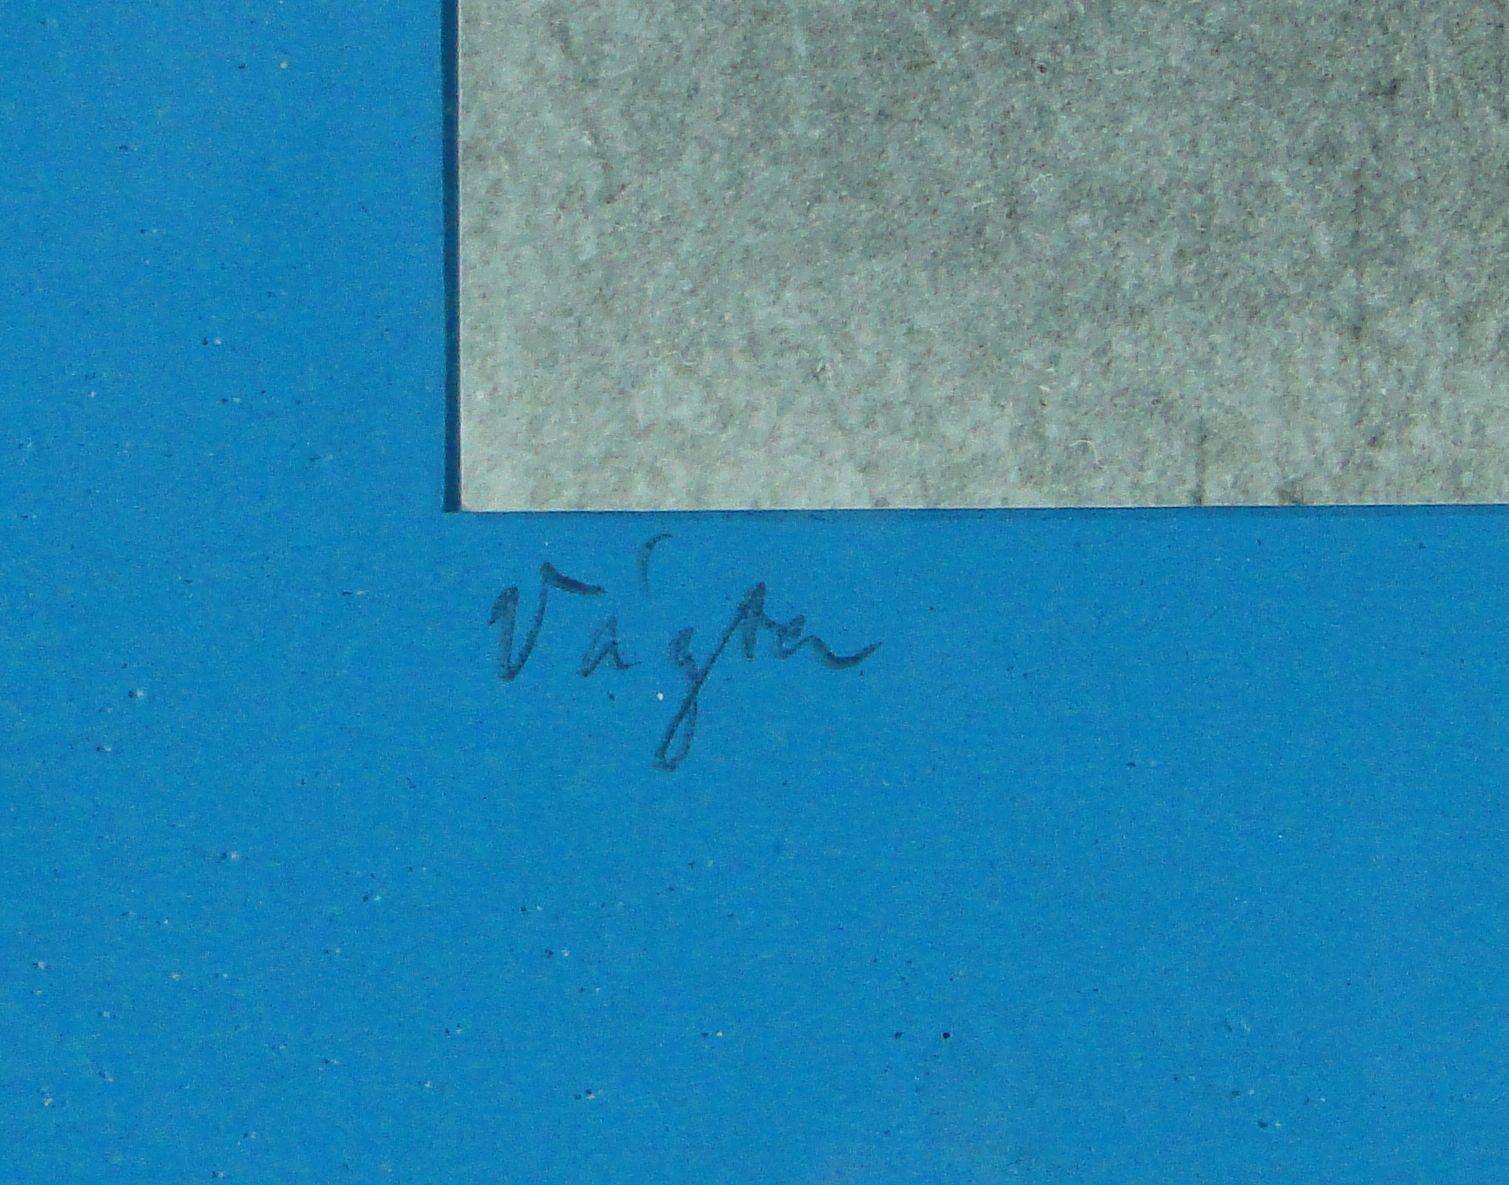 DSC05549.JPG (1509×1185)